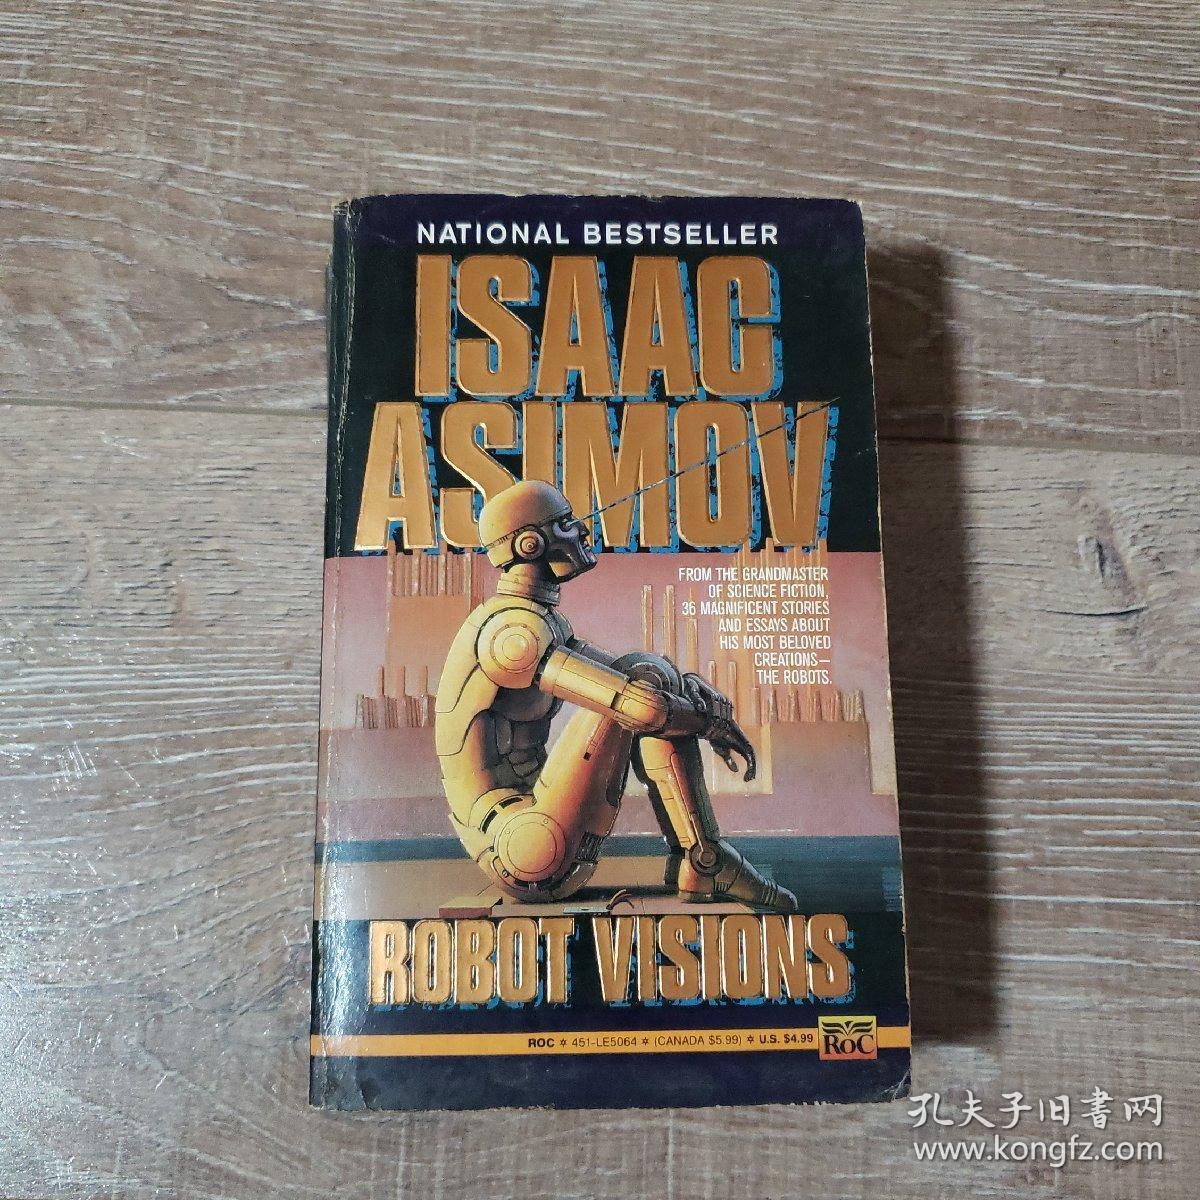 科幻英文小说robot visions 阿西莫夫